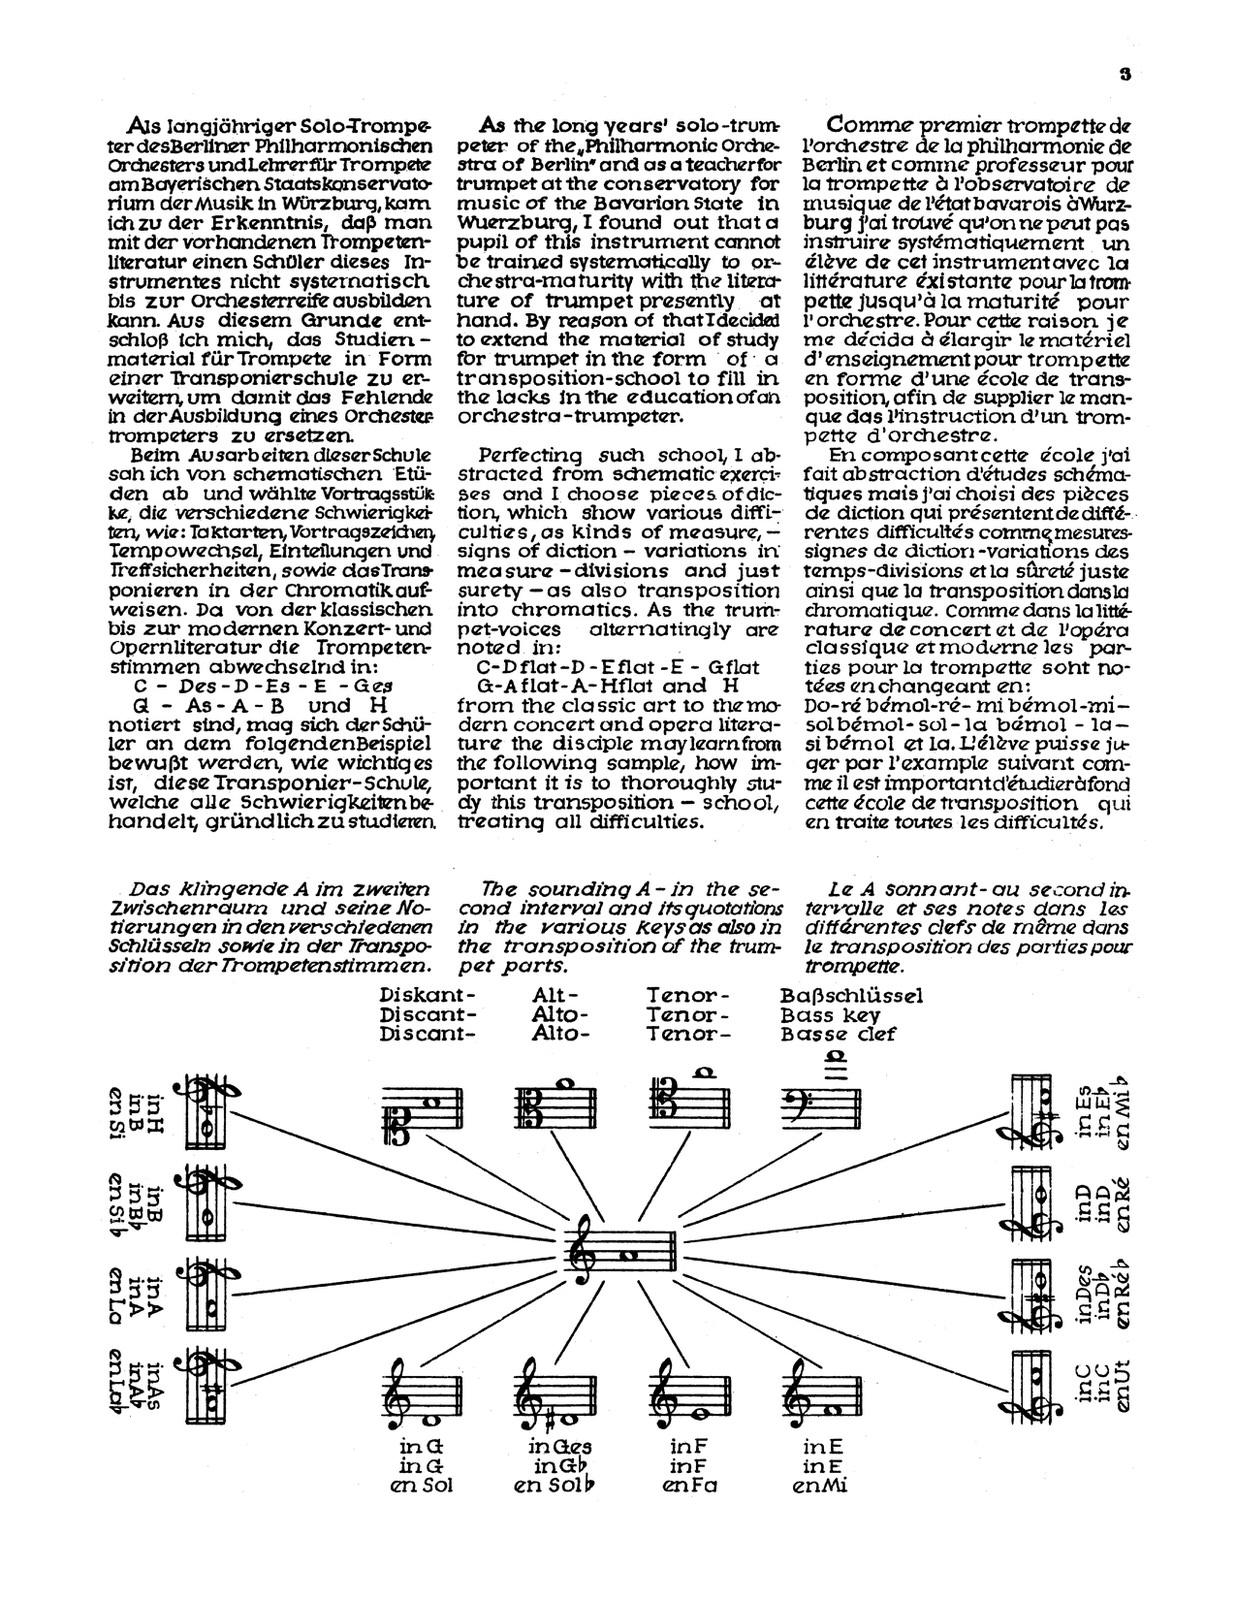 Stegmann, The Orchestra Trumpeter-p03